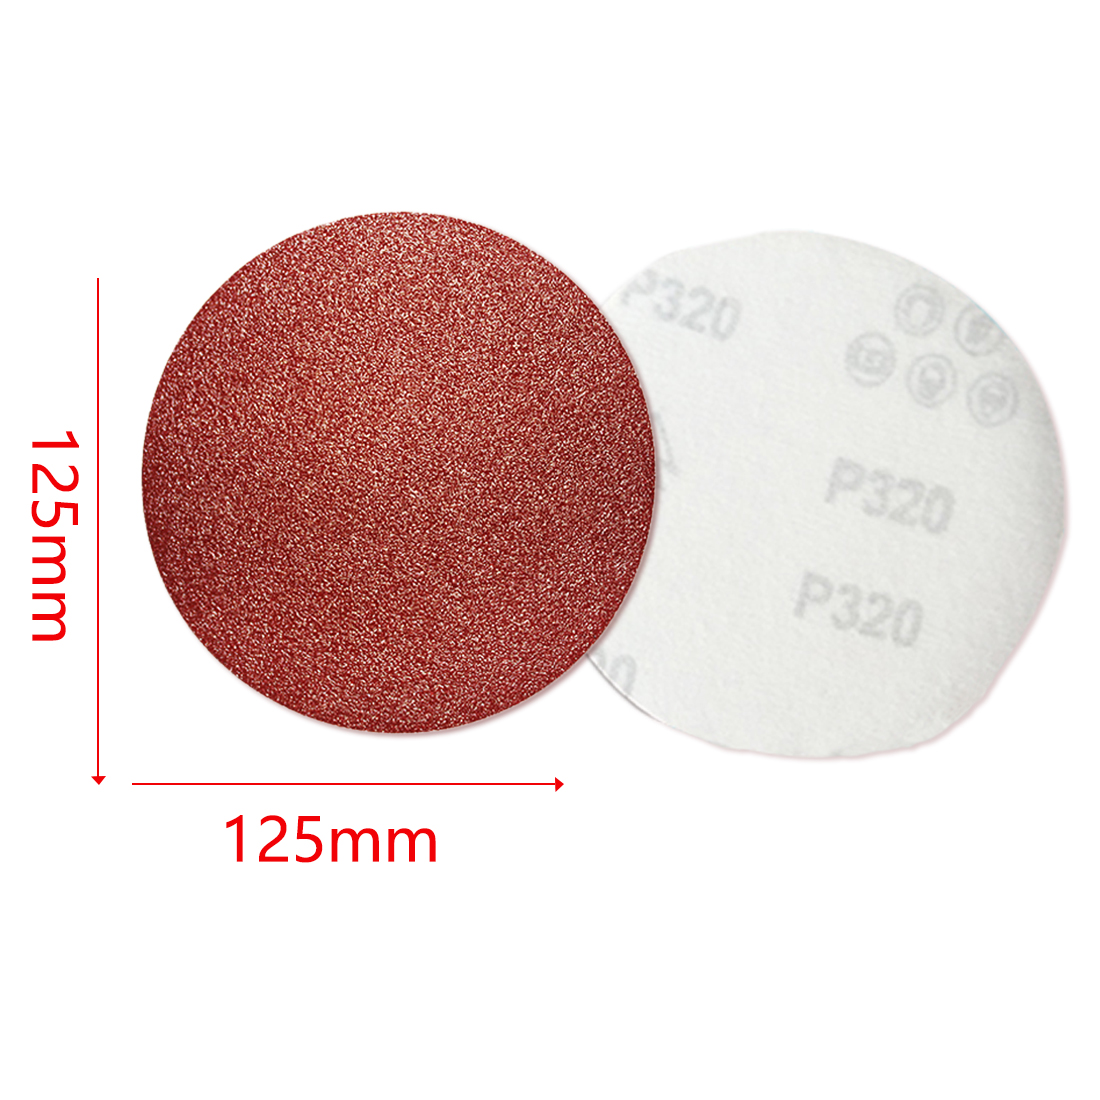 Original Import Sharpening Sand Paper Polishing Tool 5pcs 125mm Red Circular Flocking Polishing Disc With Grits 80-1000